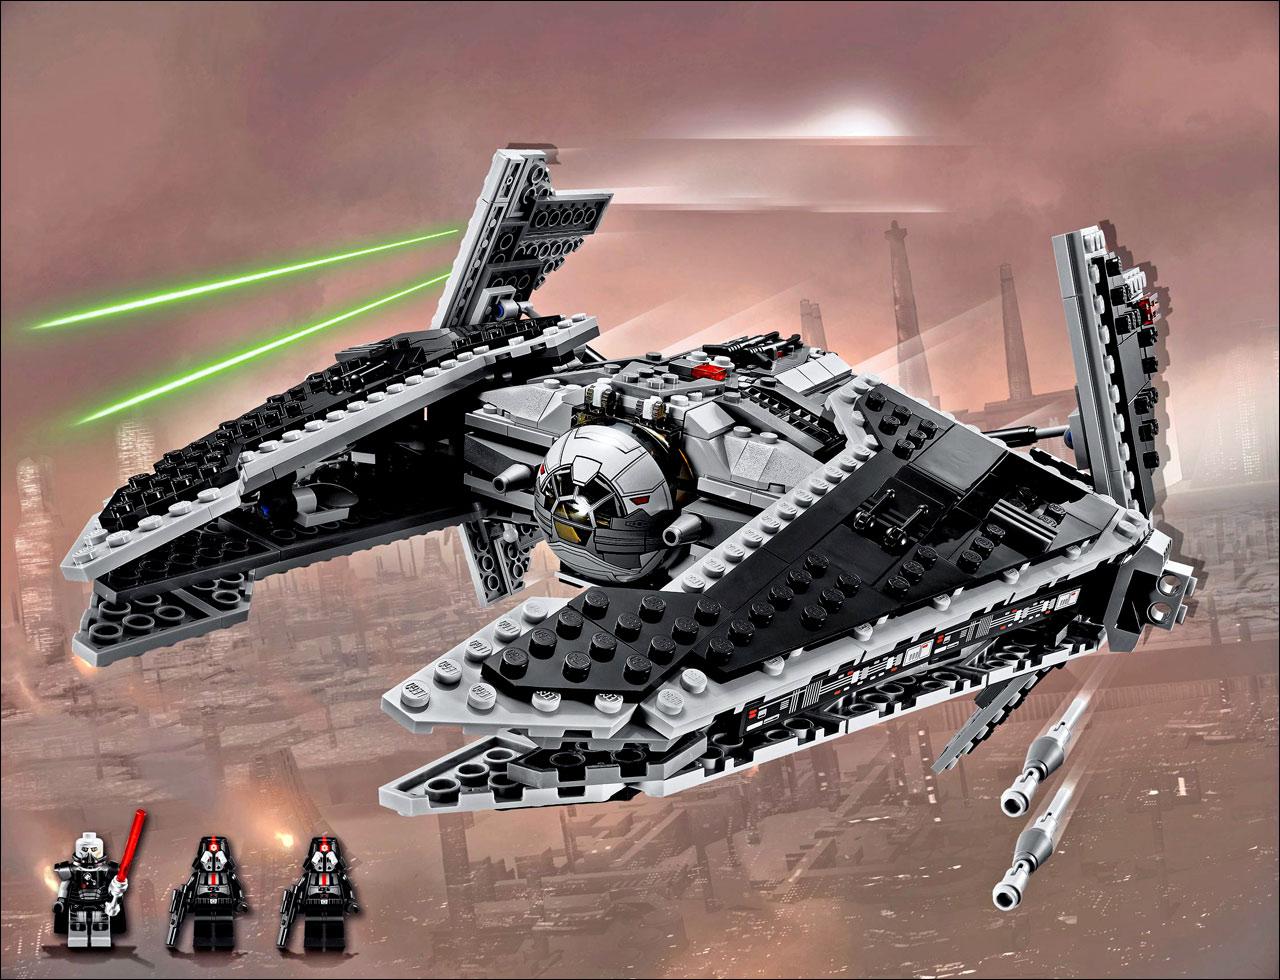 illustration du set 9500 sith fury class interceptor nouveauts lego star wars 2012